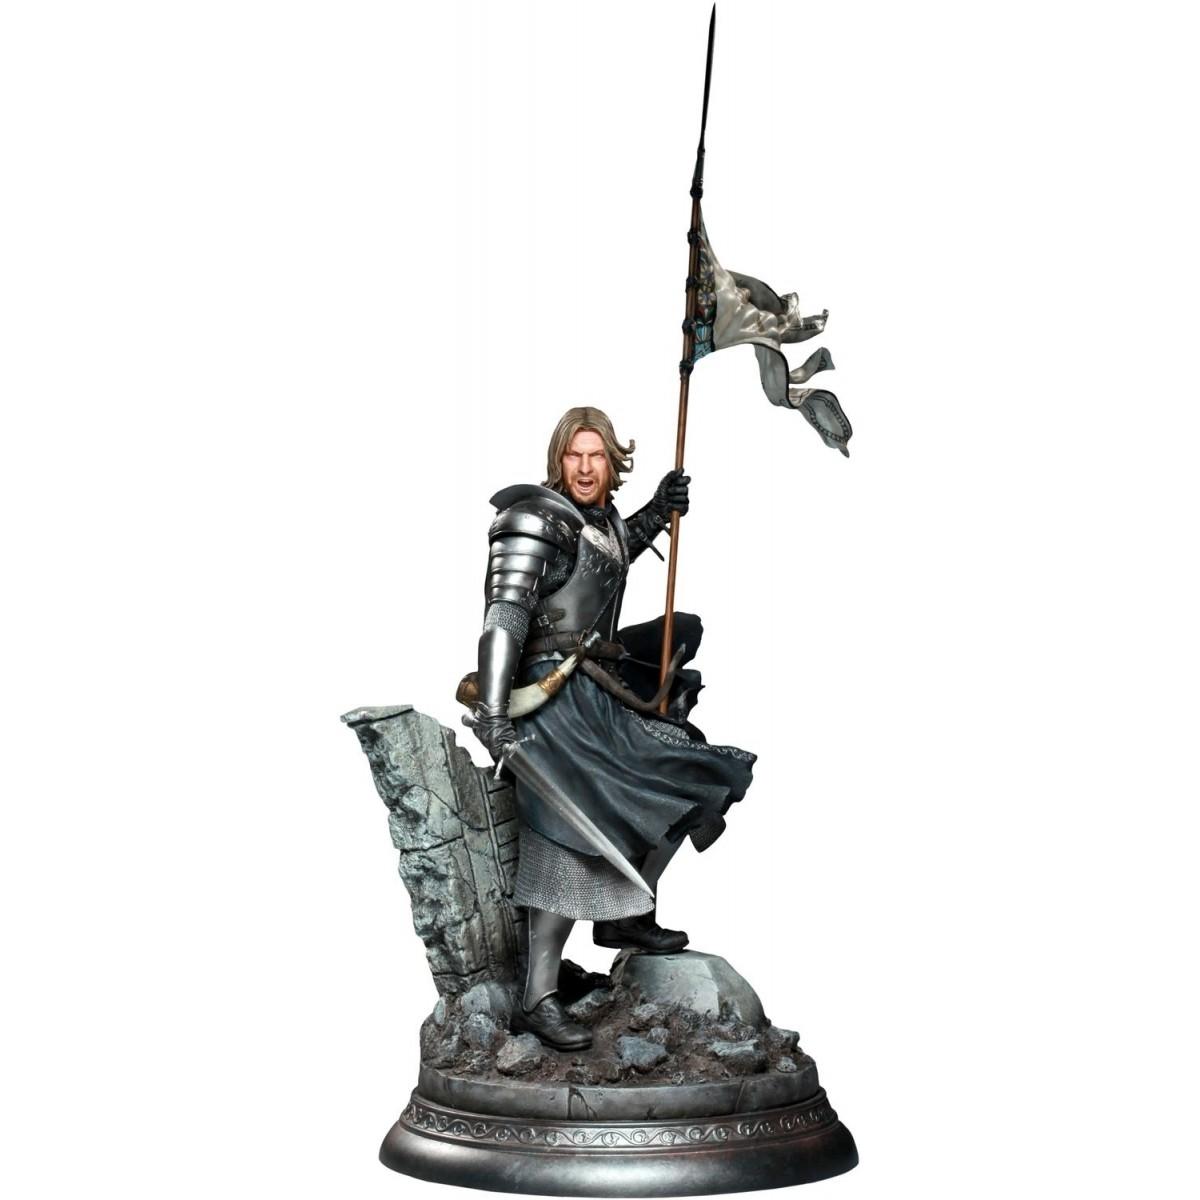 Estátua Boromir: O Senhor dos Anéis (The Lord of the Rings) - Sideshow